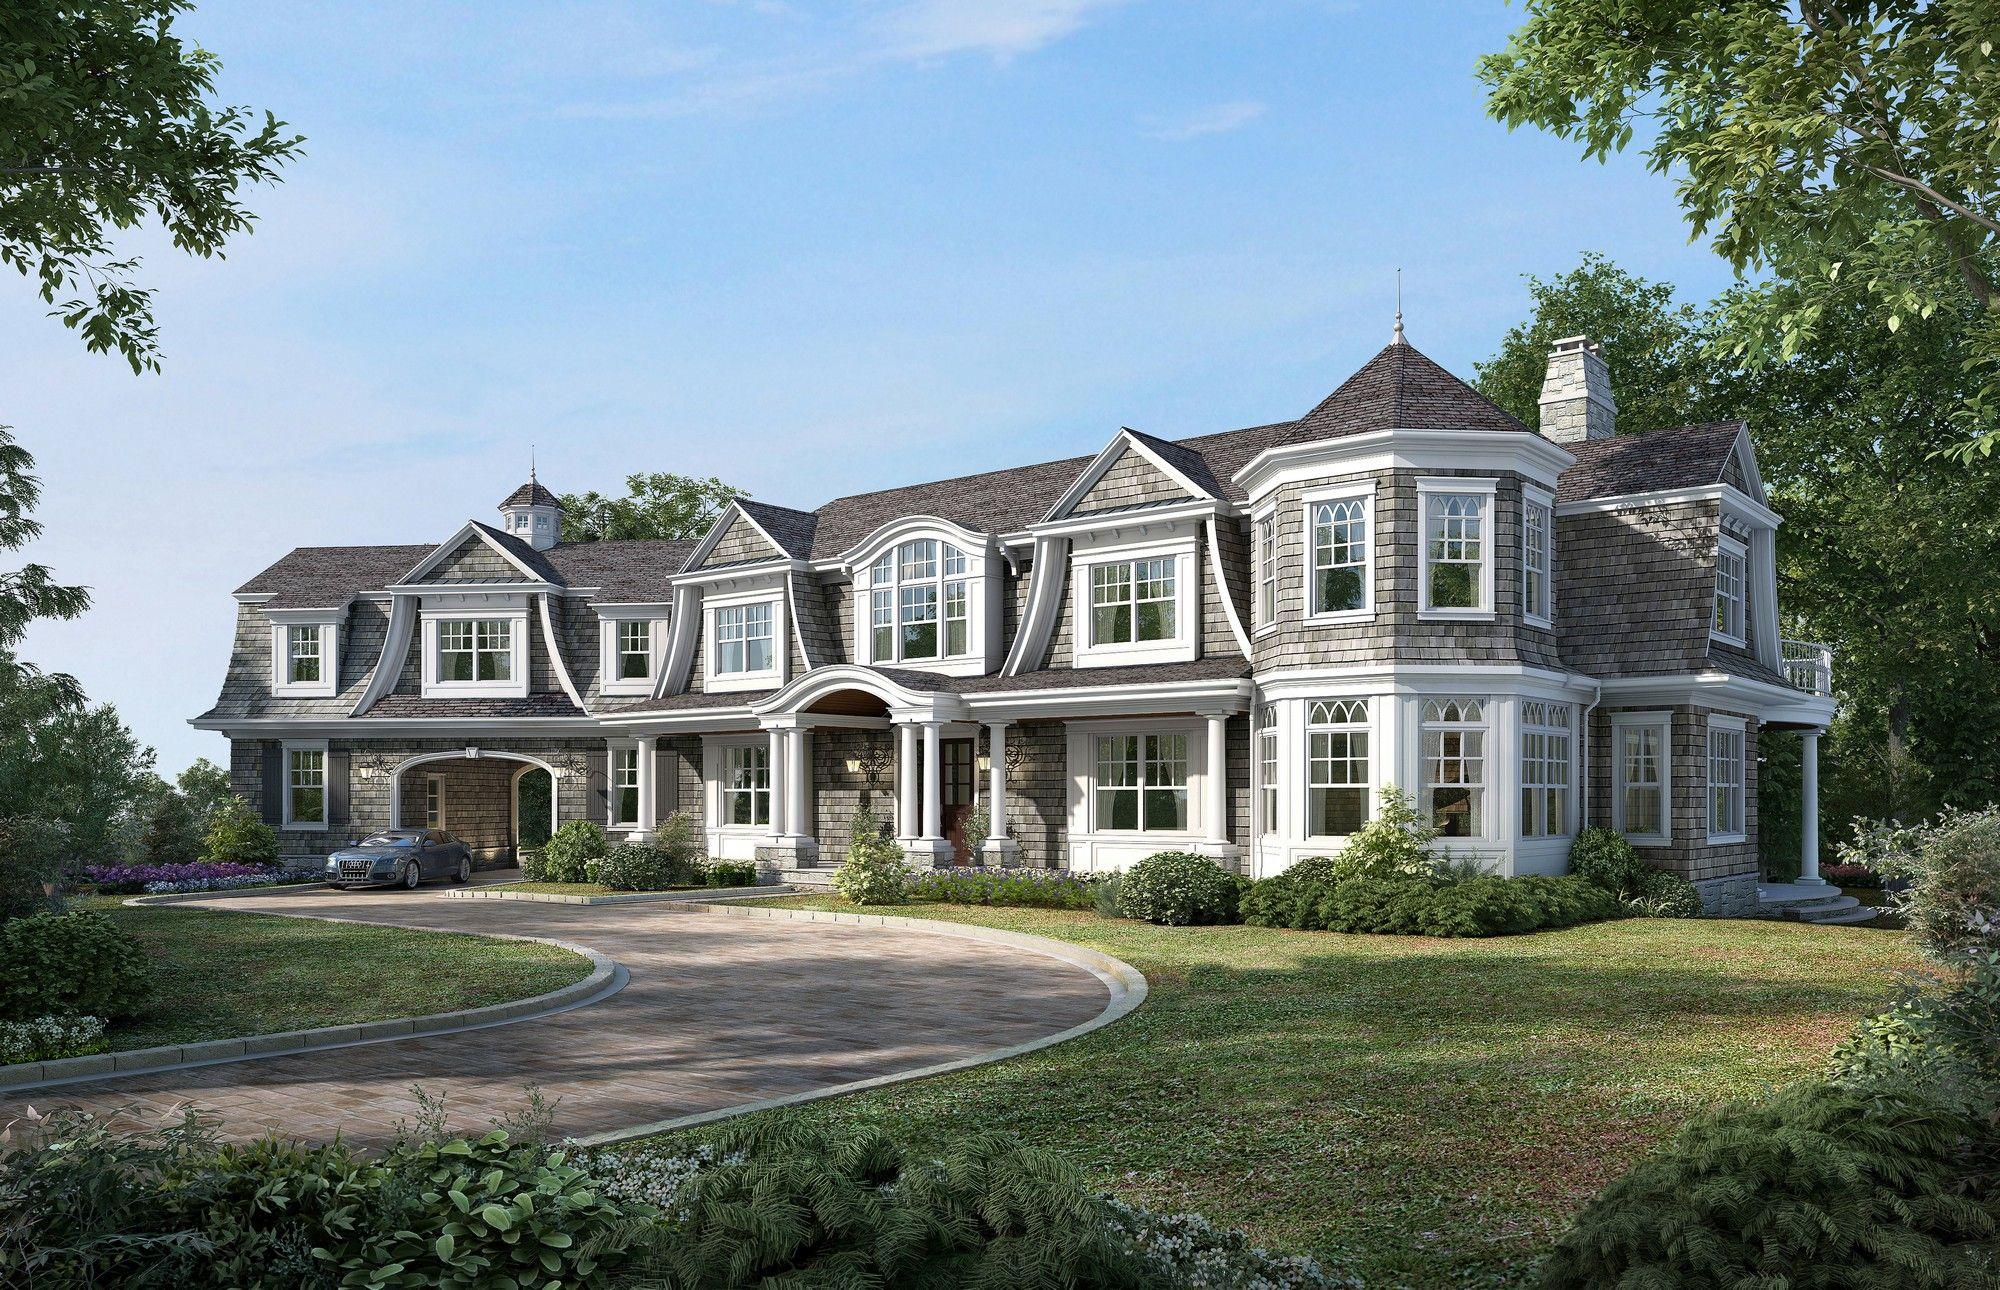 Shingle Style House Design Google Search Shingle Style Shingle Style Homes Mansions